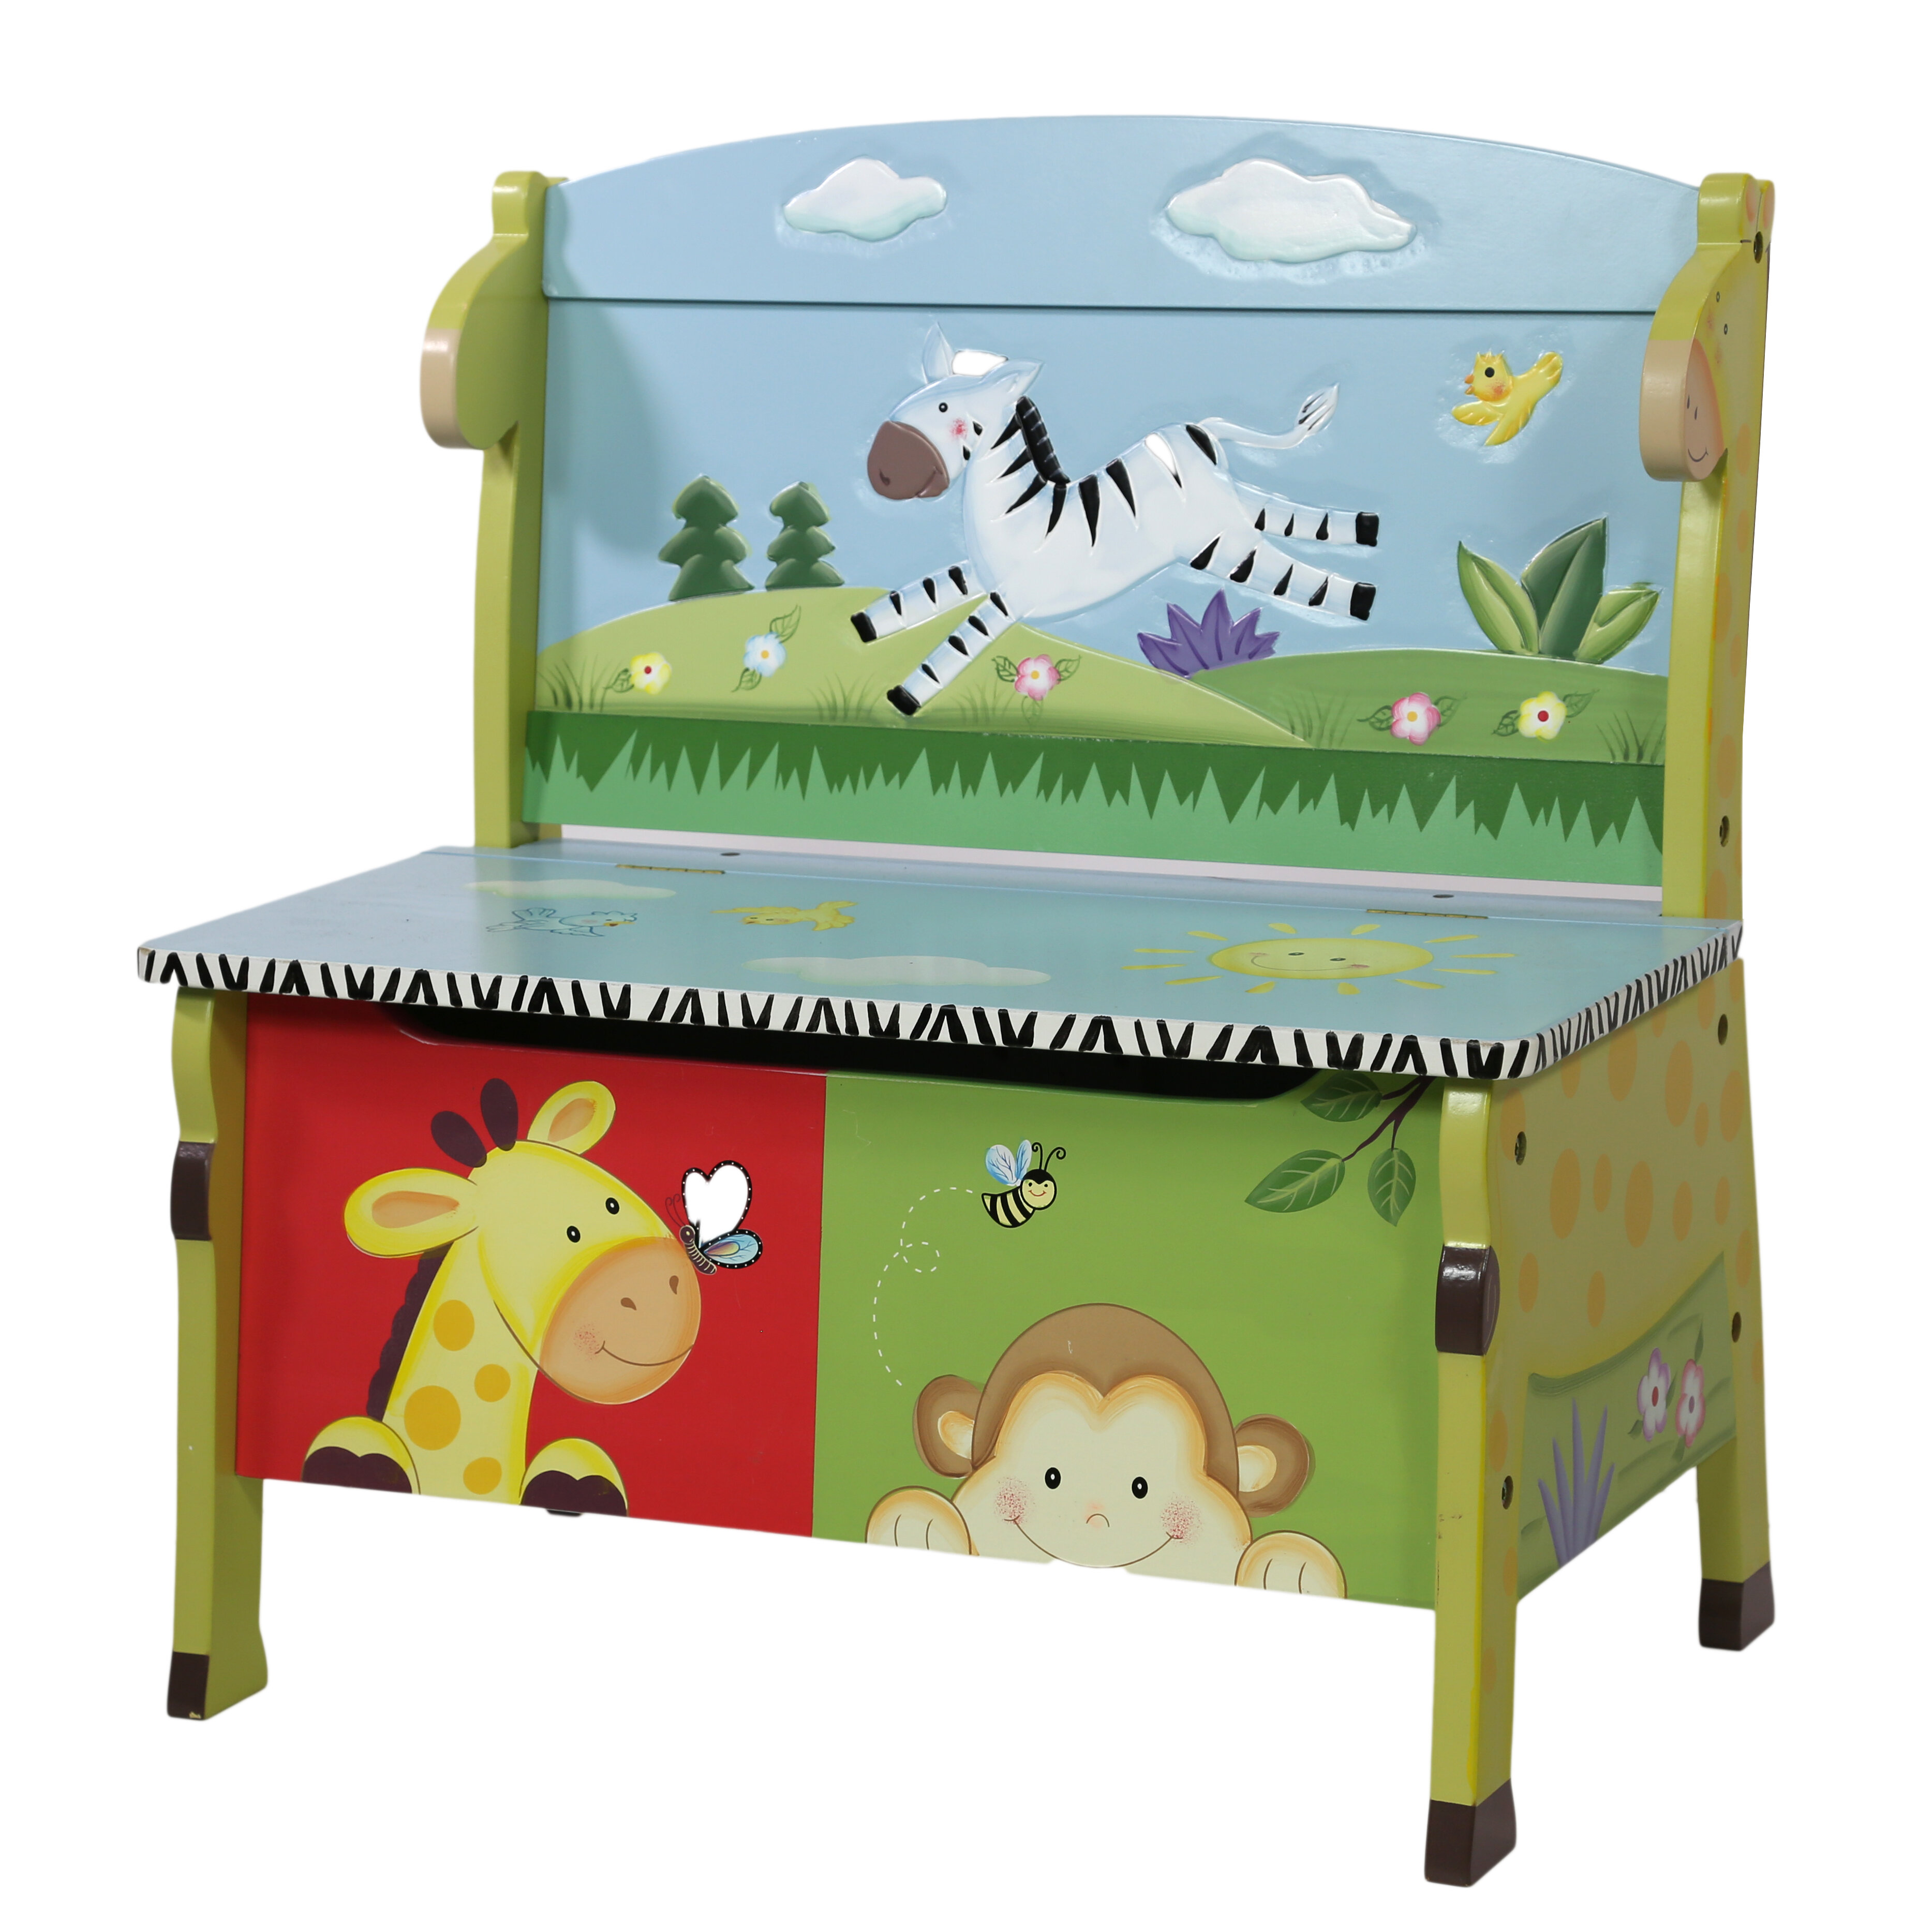 Trunk Storage Furniture Kids Toy Chest Guidecraft Brooklyn Toy Box ...